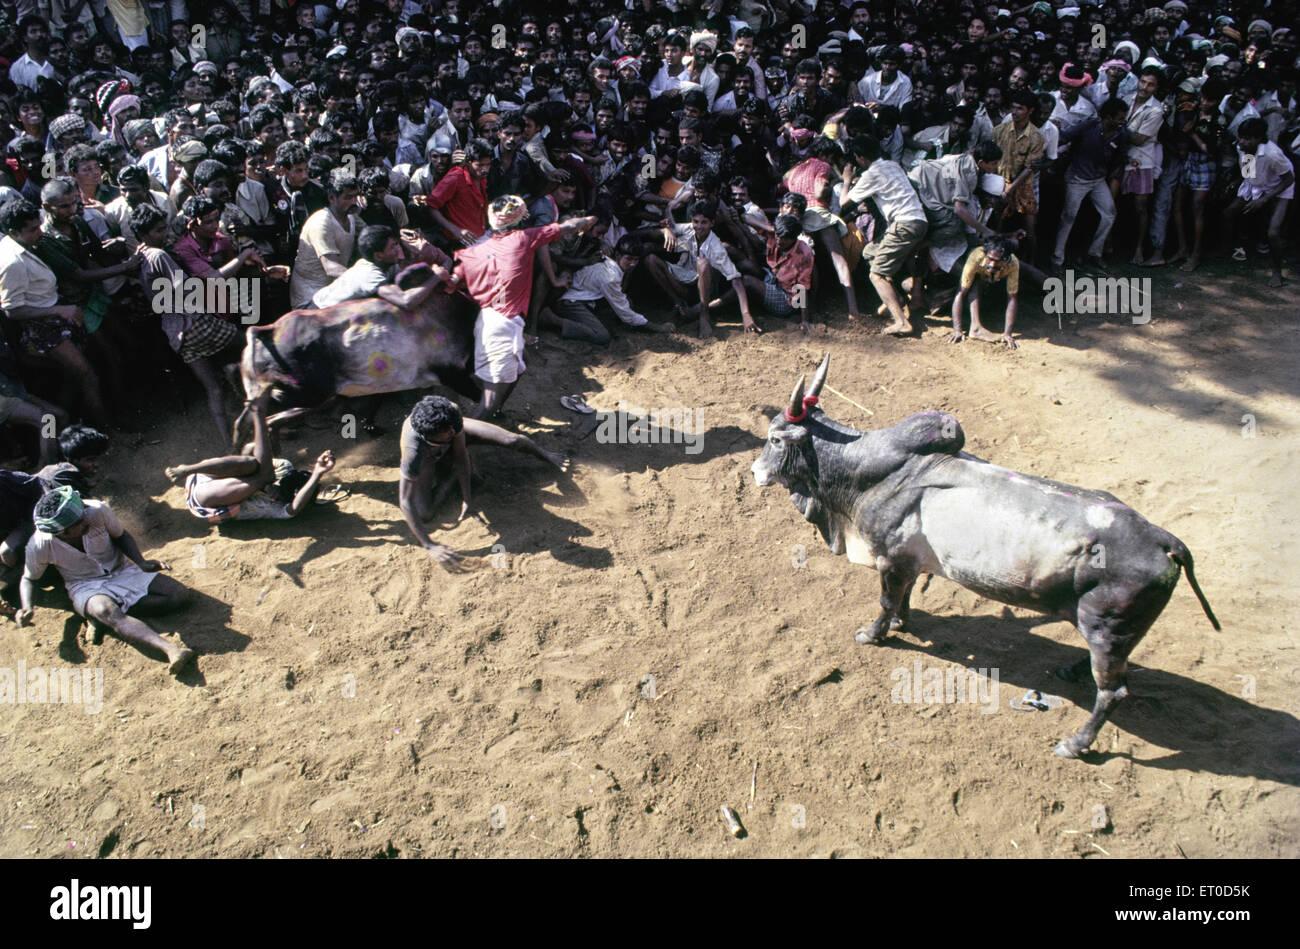 Jallikattu , sallikkattu , manju virattu , eru thazhuvuthal  , bull taming festival at Alanganallur near Madurai - Stock Image